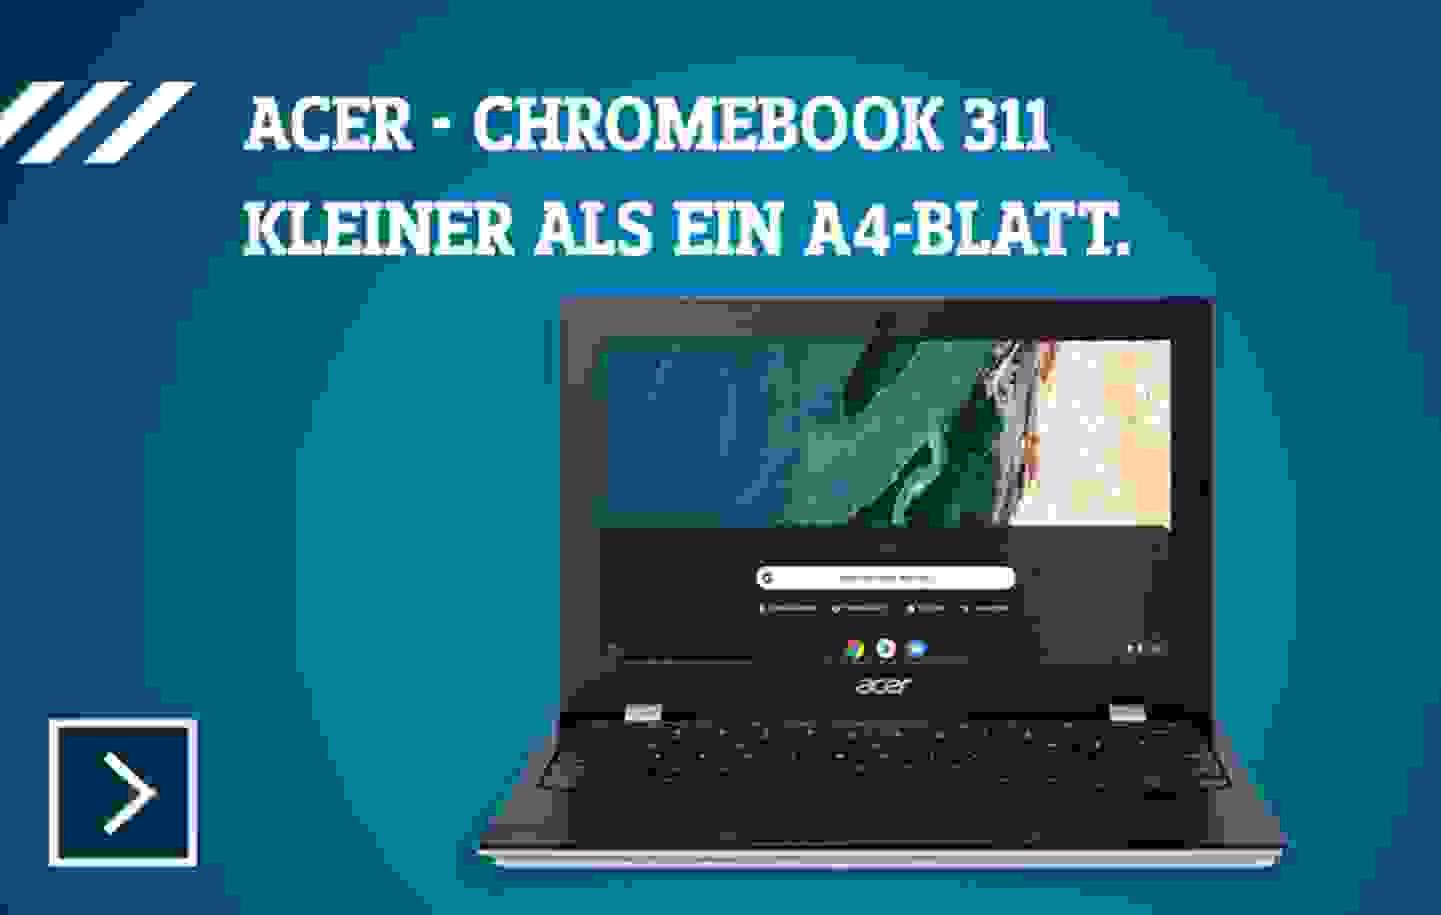 Acer - Chromebook 311 »